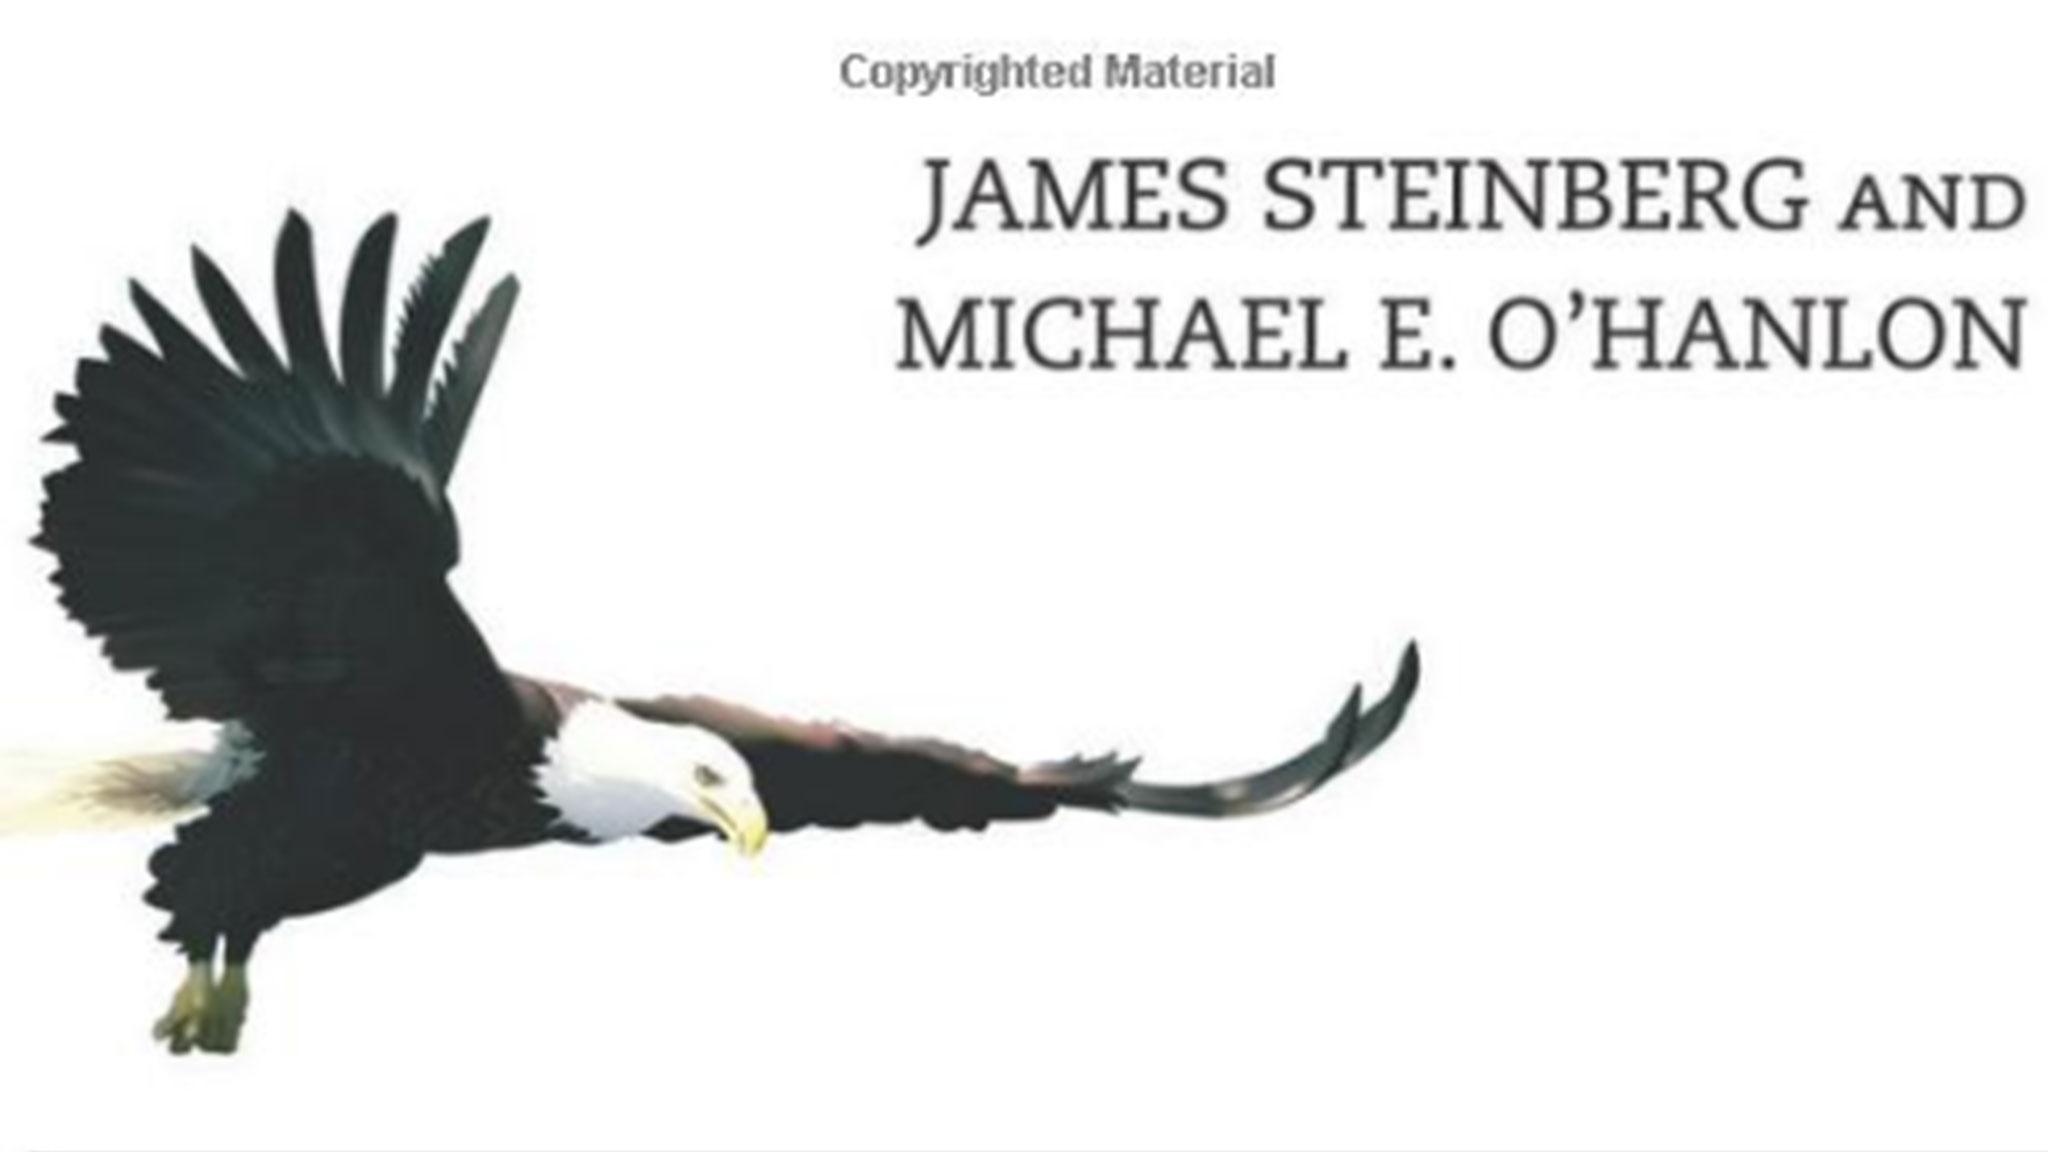 strategic reassurance and resolve steinberg james o hanlon michael e